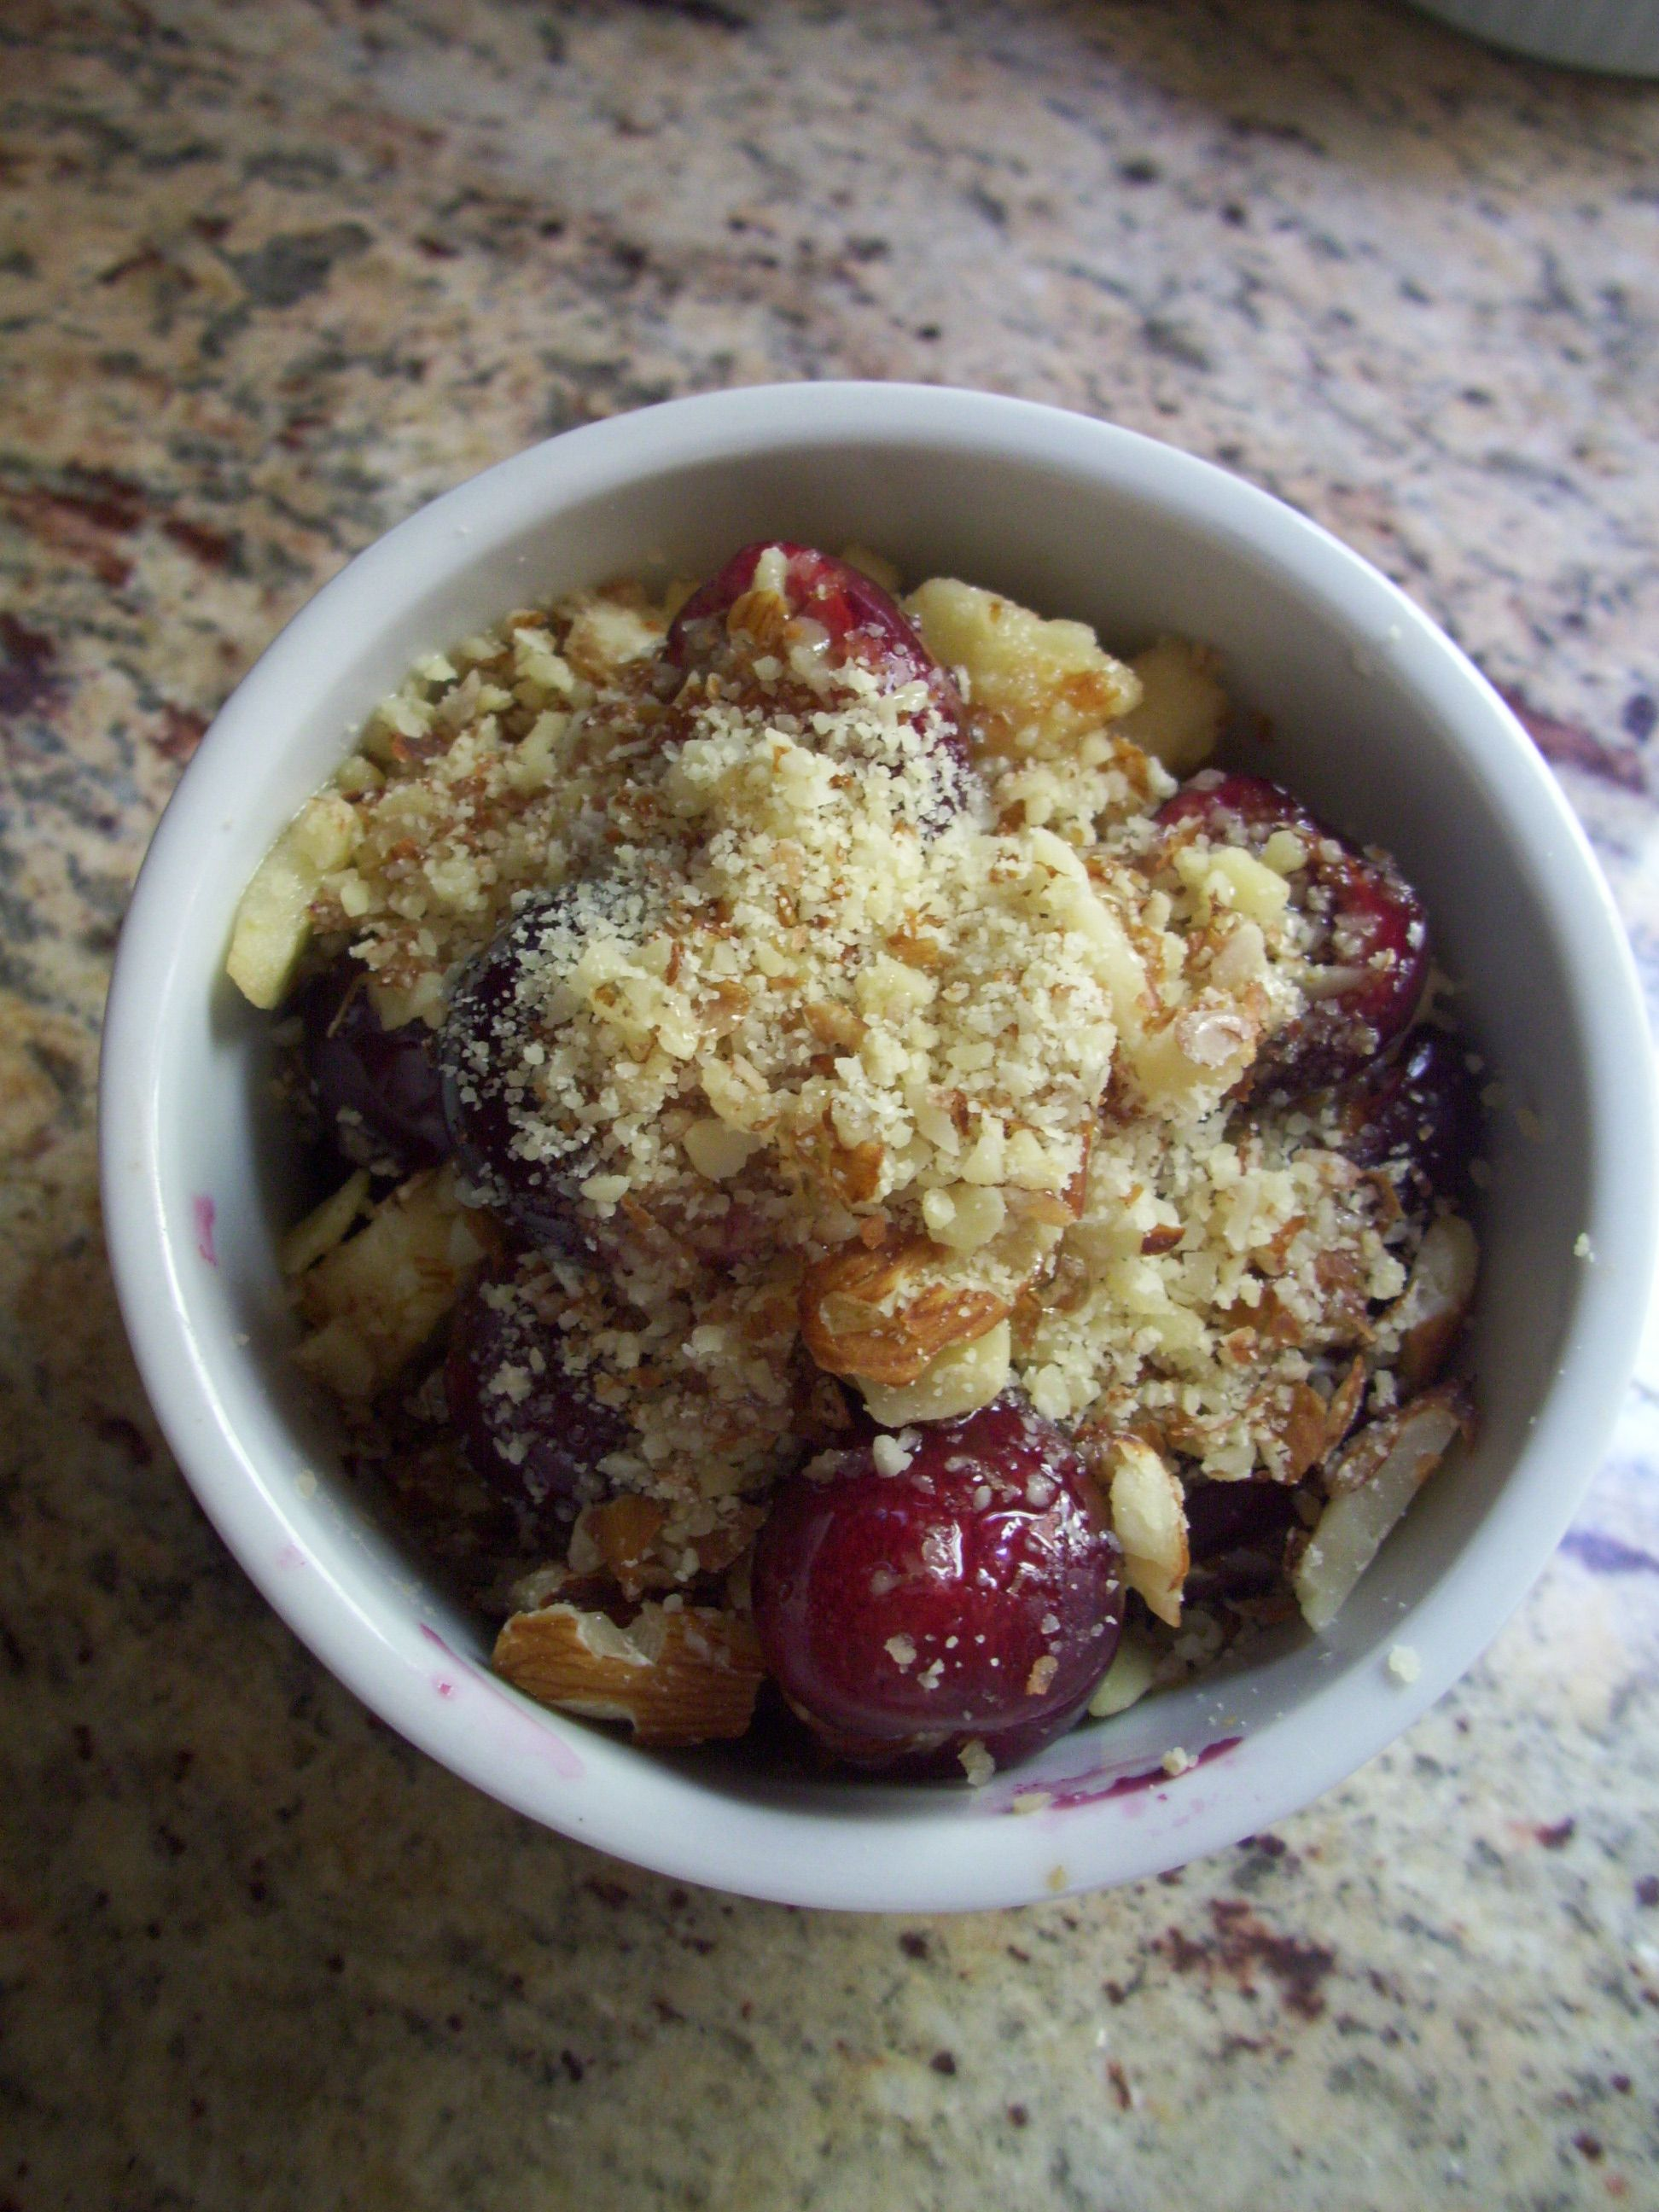 Cherry Cobbler (Delicious AND Allergen Free)